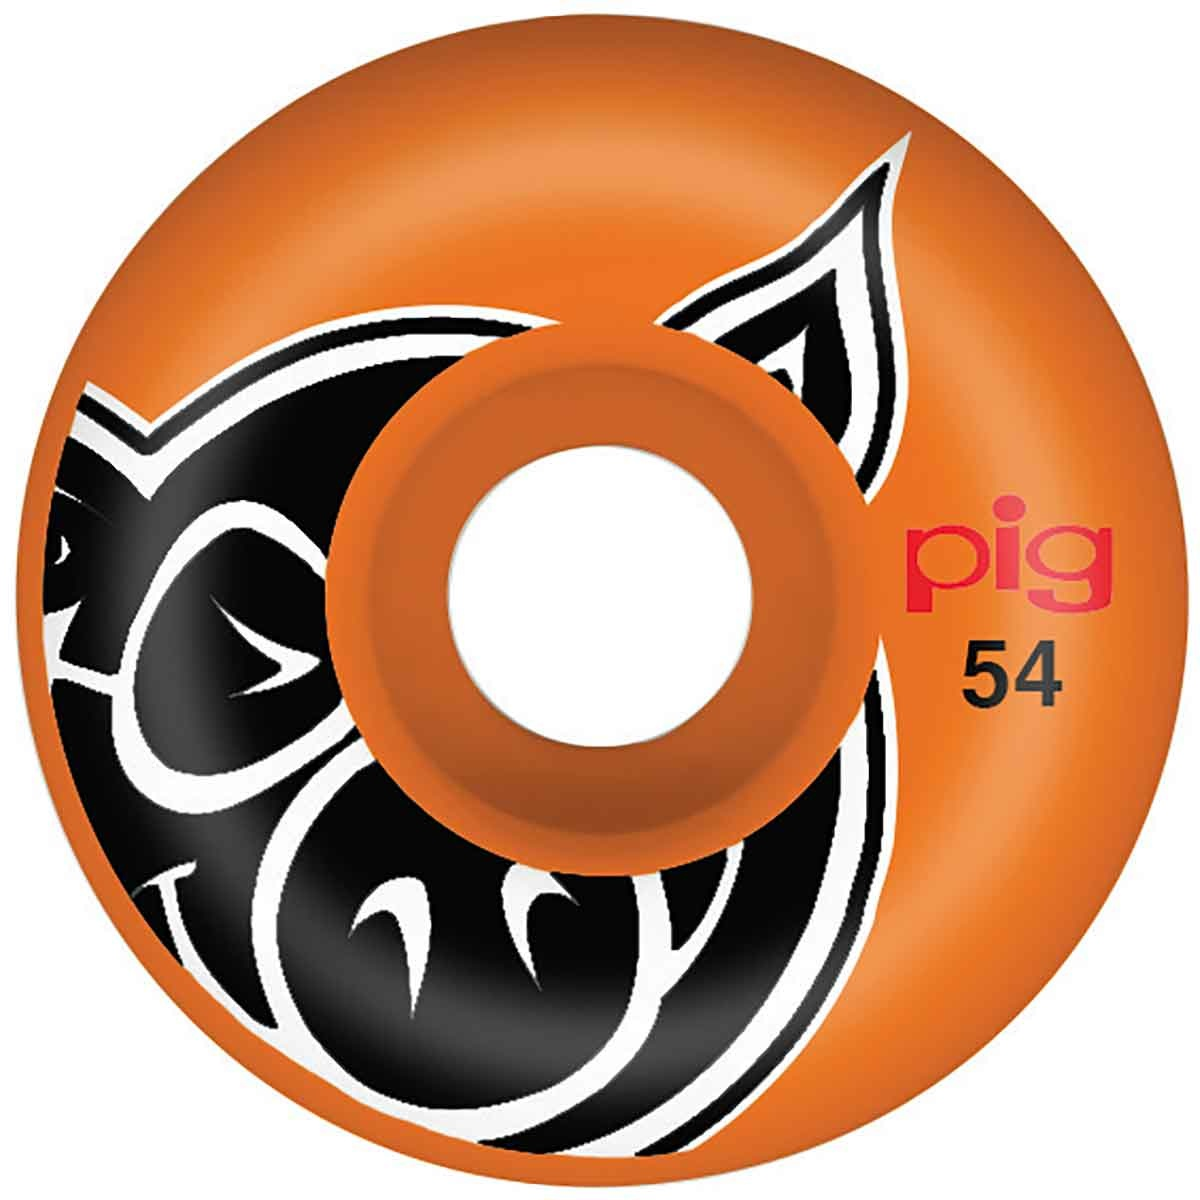 Pig Wheels Pig Head Orange Proline 54mm